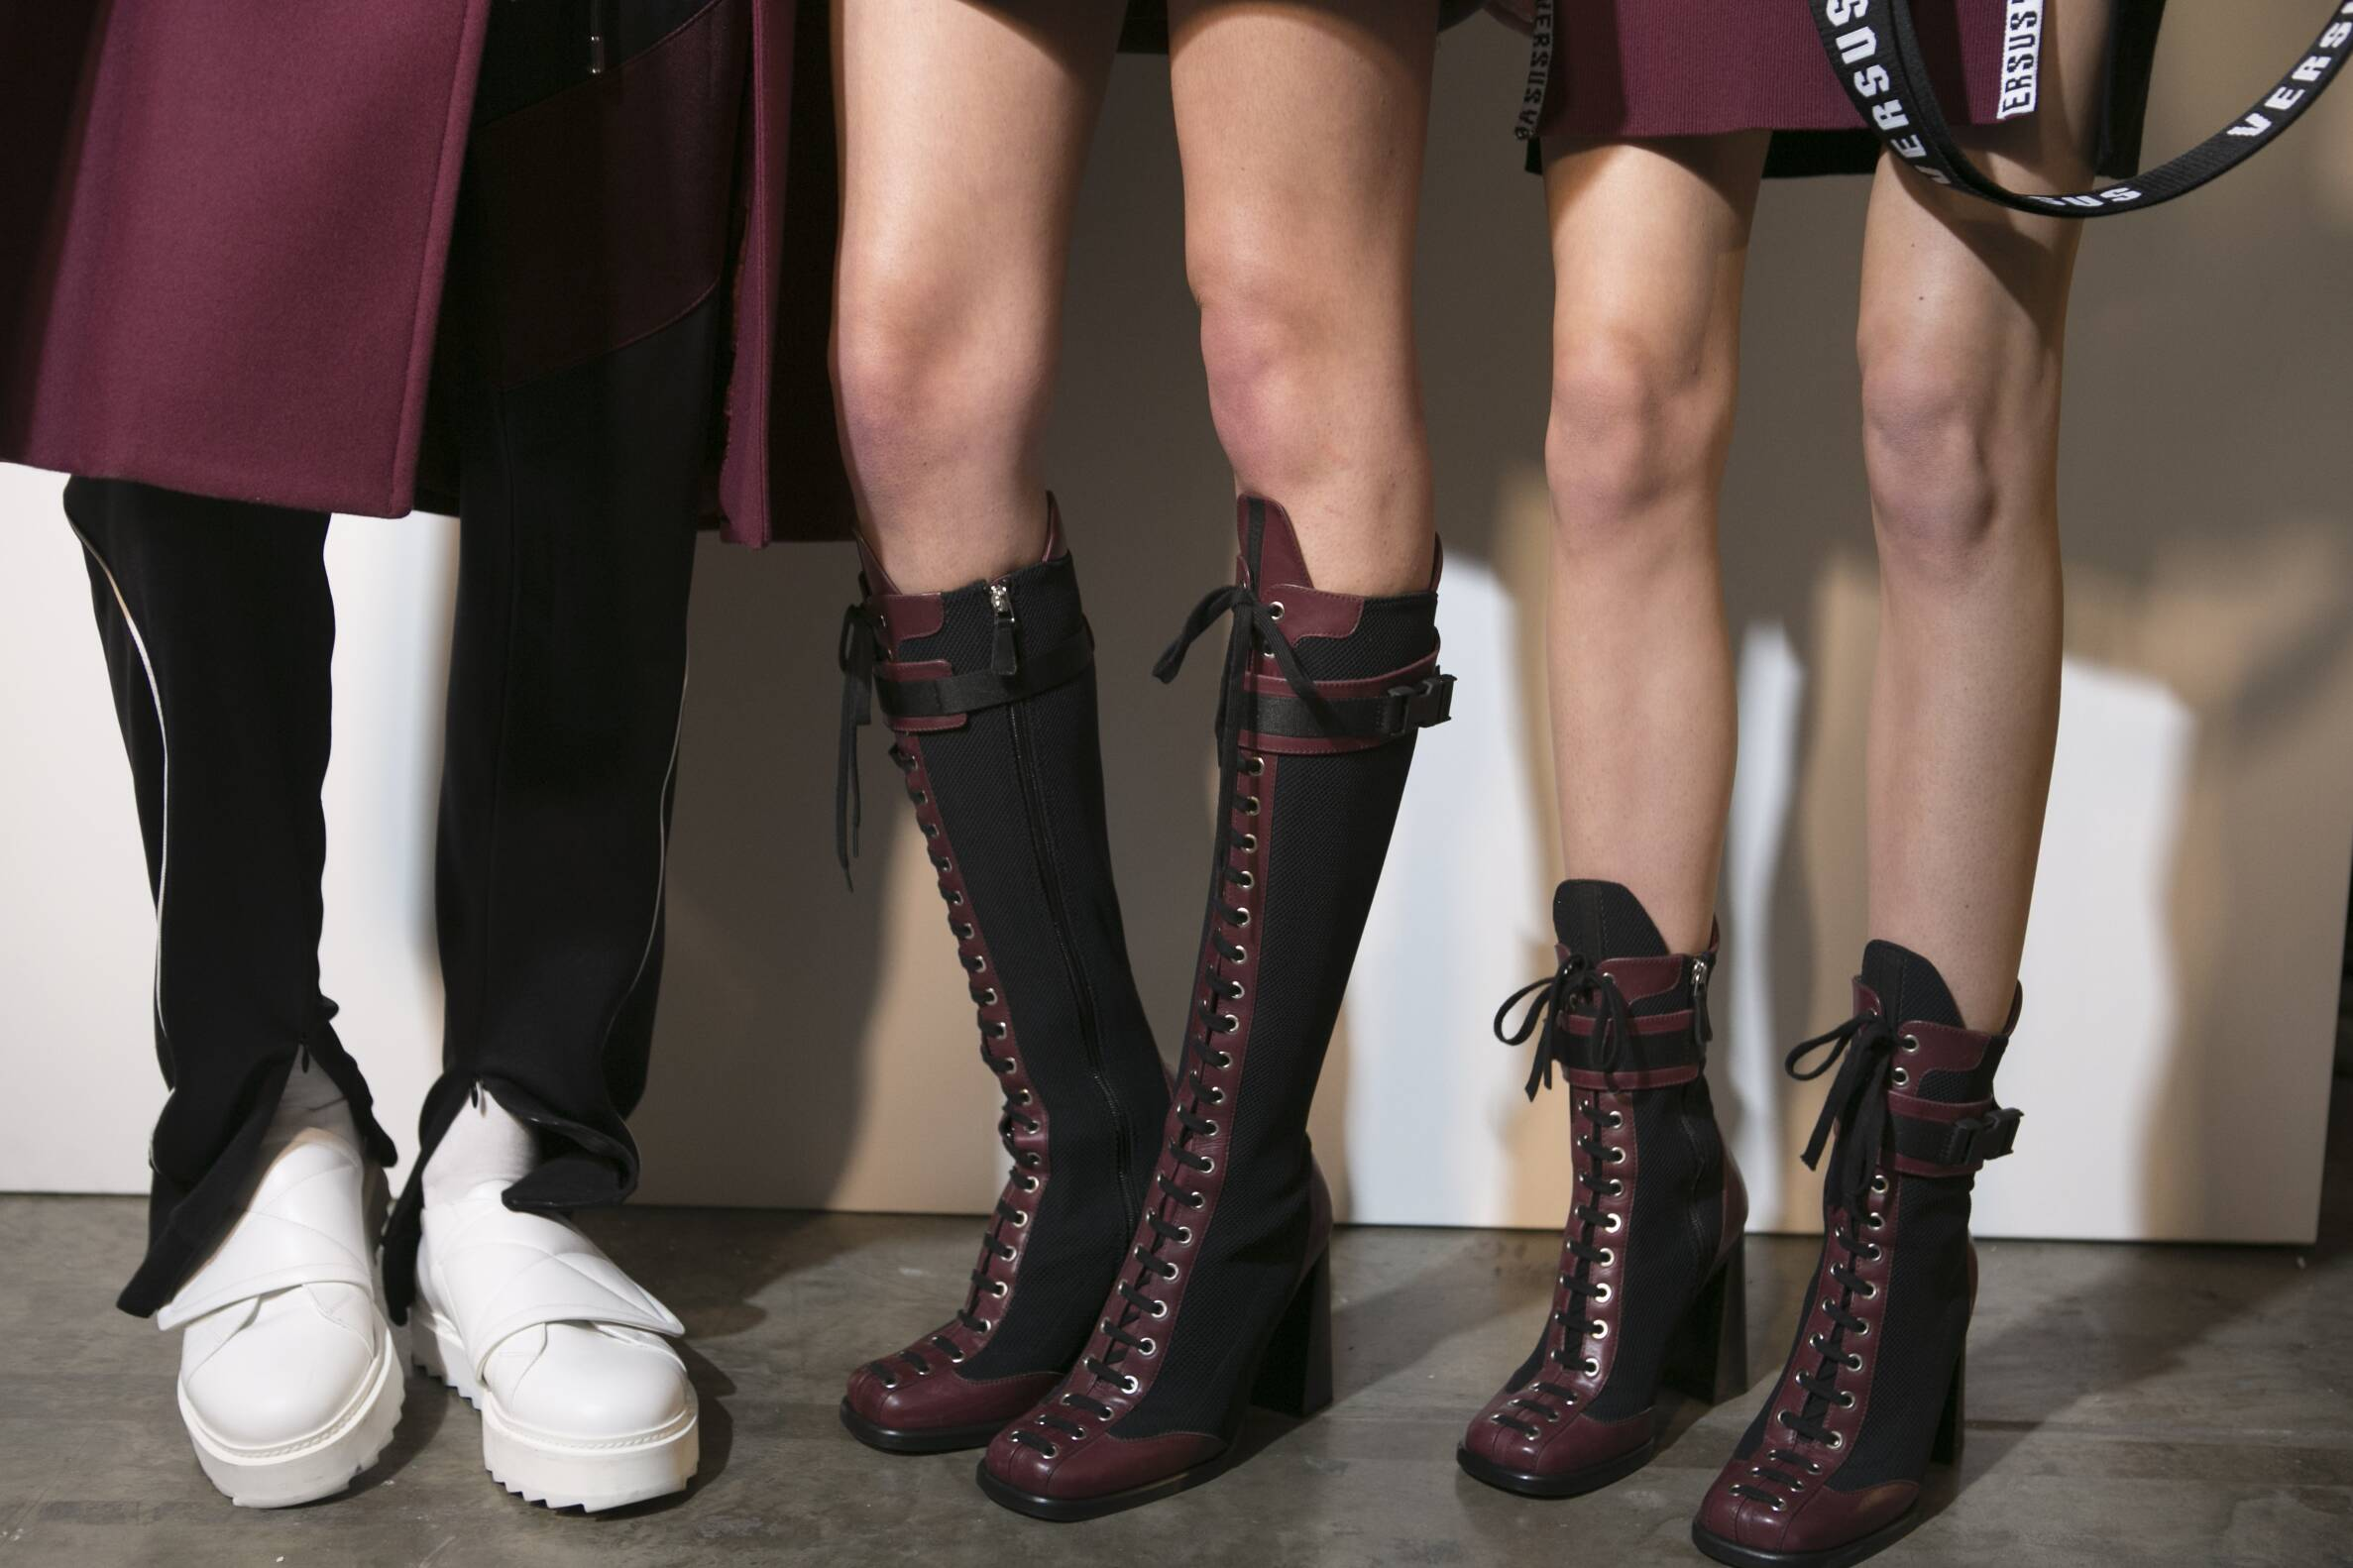 Versus Versace Backstage Fashion Models Shoes Details